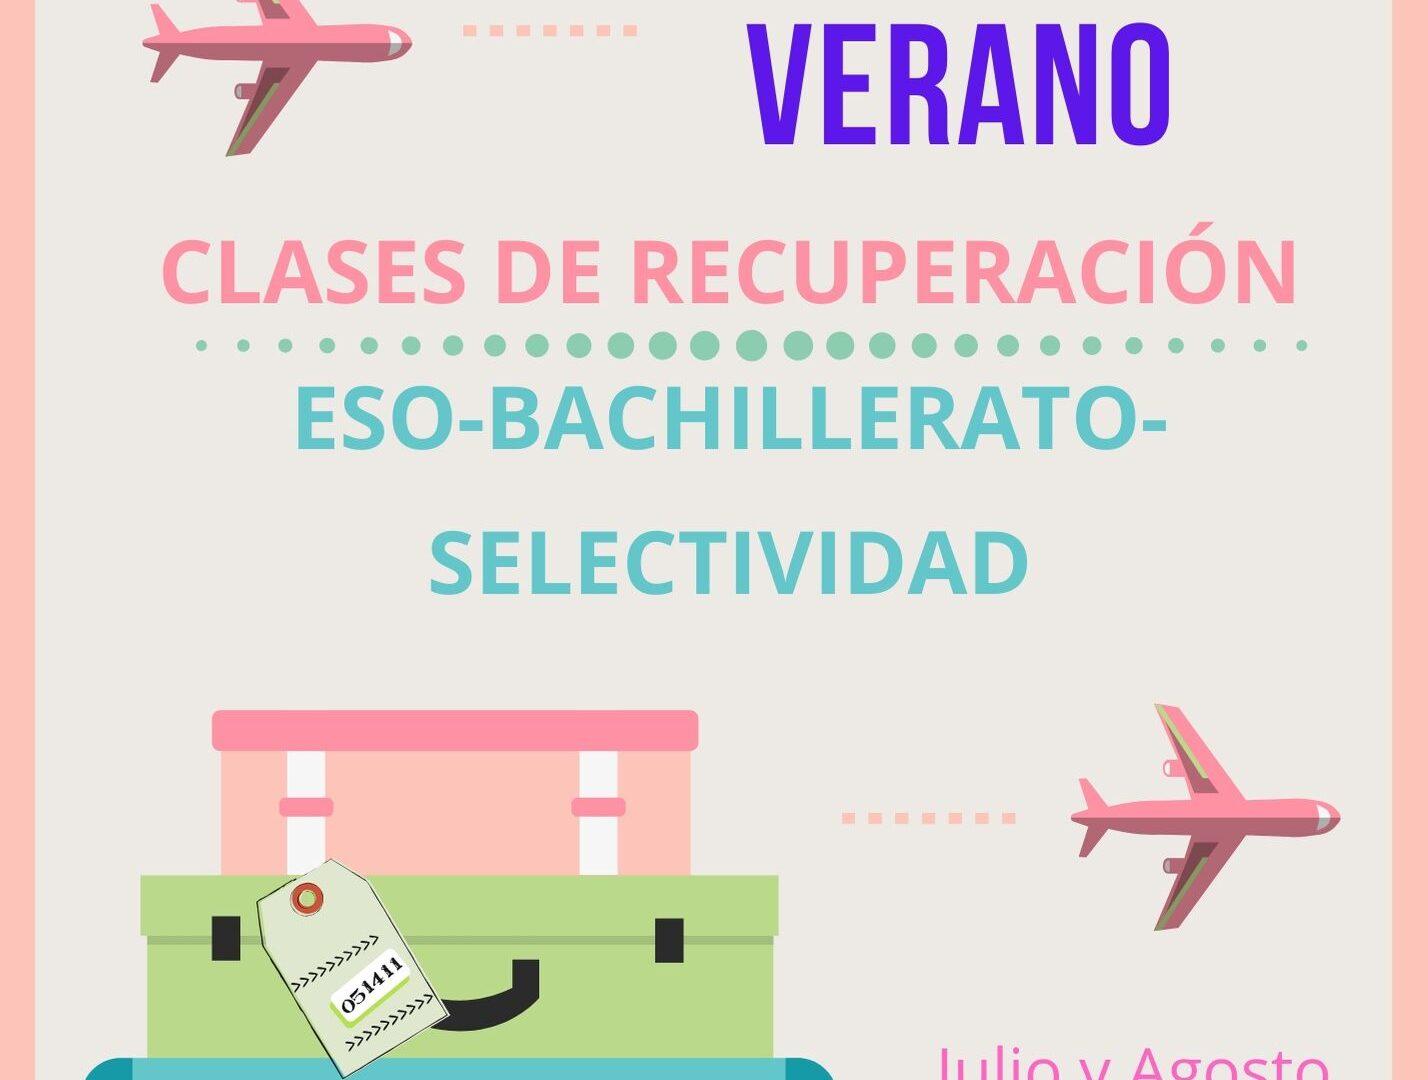 CLASES DE RECUPERACIÓN